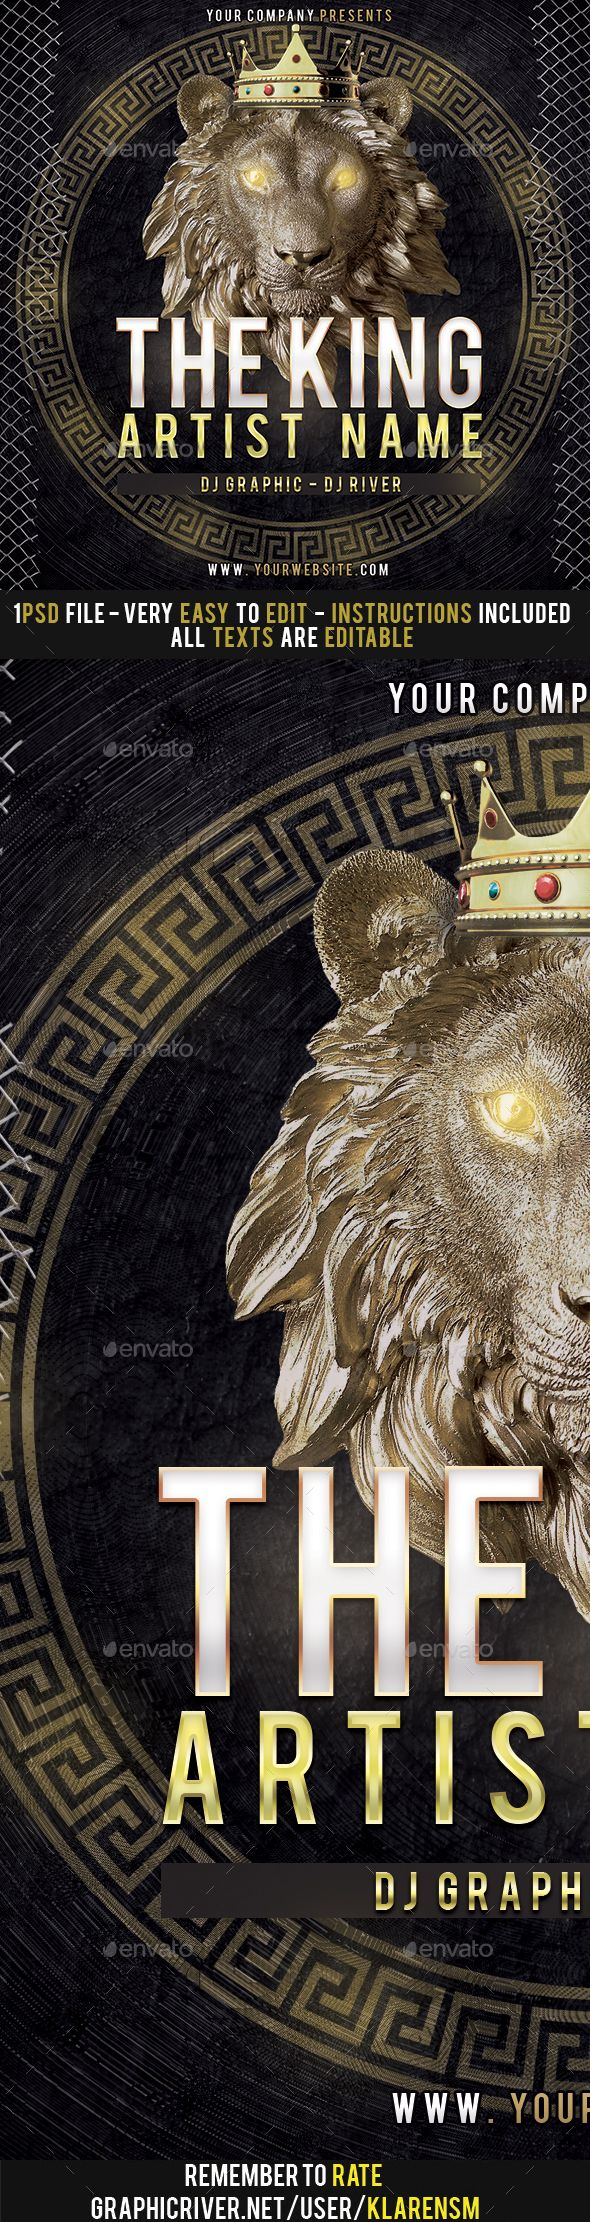 Lion Mixtape Album CD Cover Template